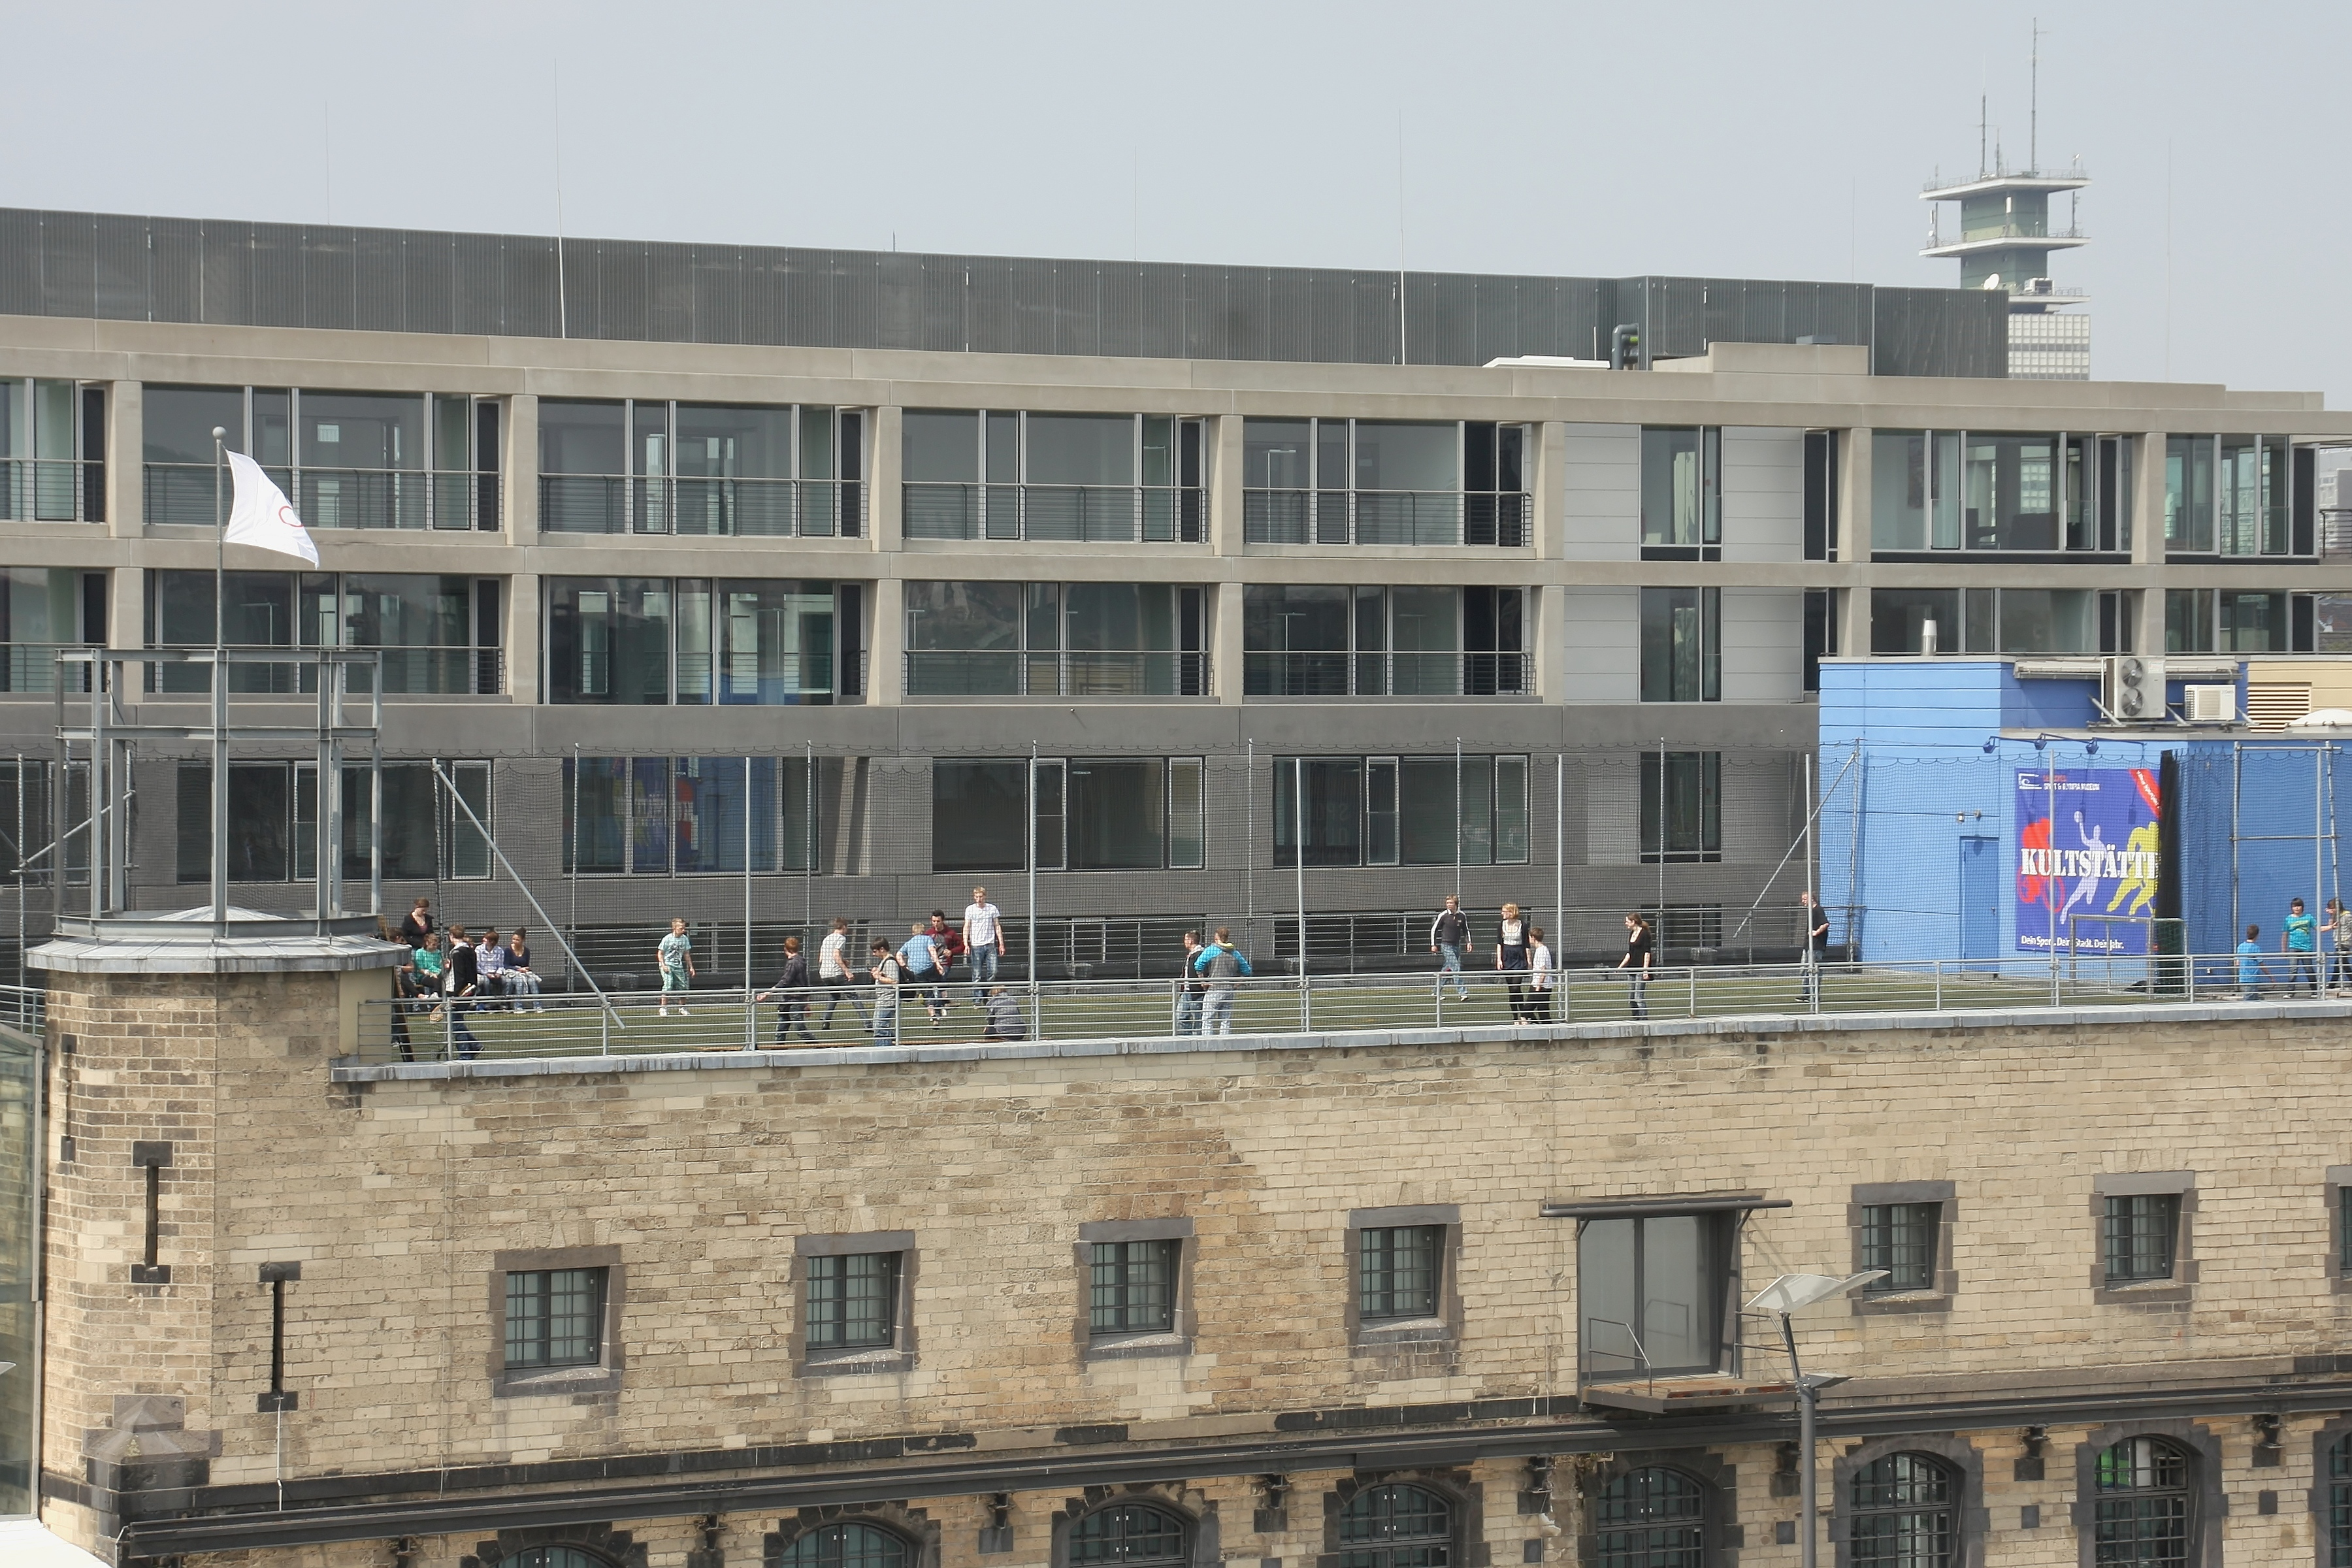 file rheinauhafen sport und olympiamuseum sportplatz auf dem dach 8704 jpg wikimedia